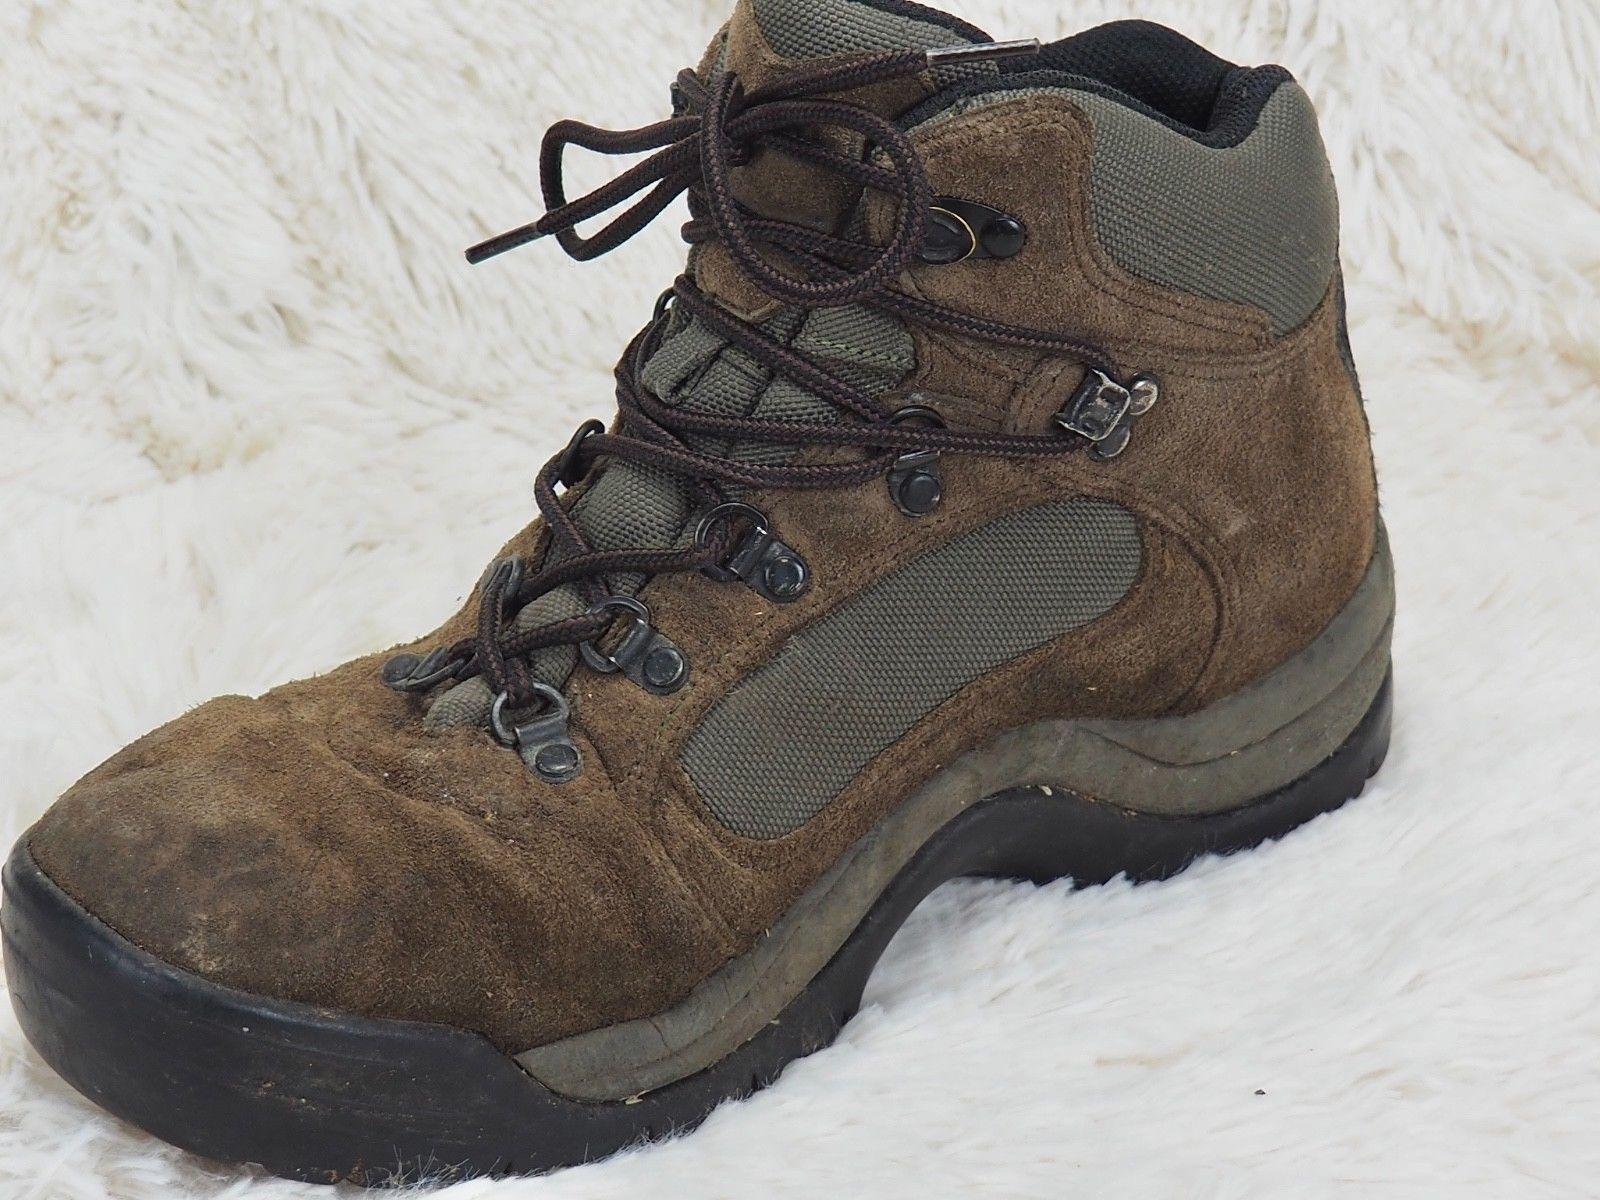 d9228d7d451 Vasque Ranger GTX Gore Tex Boots 7210 Brown and 38 similar items